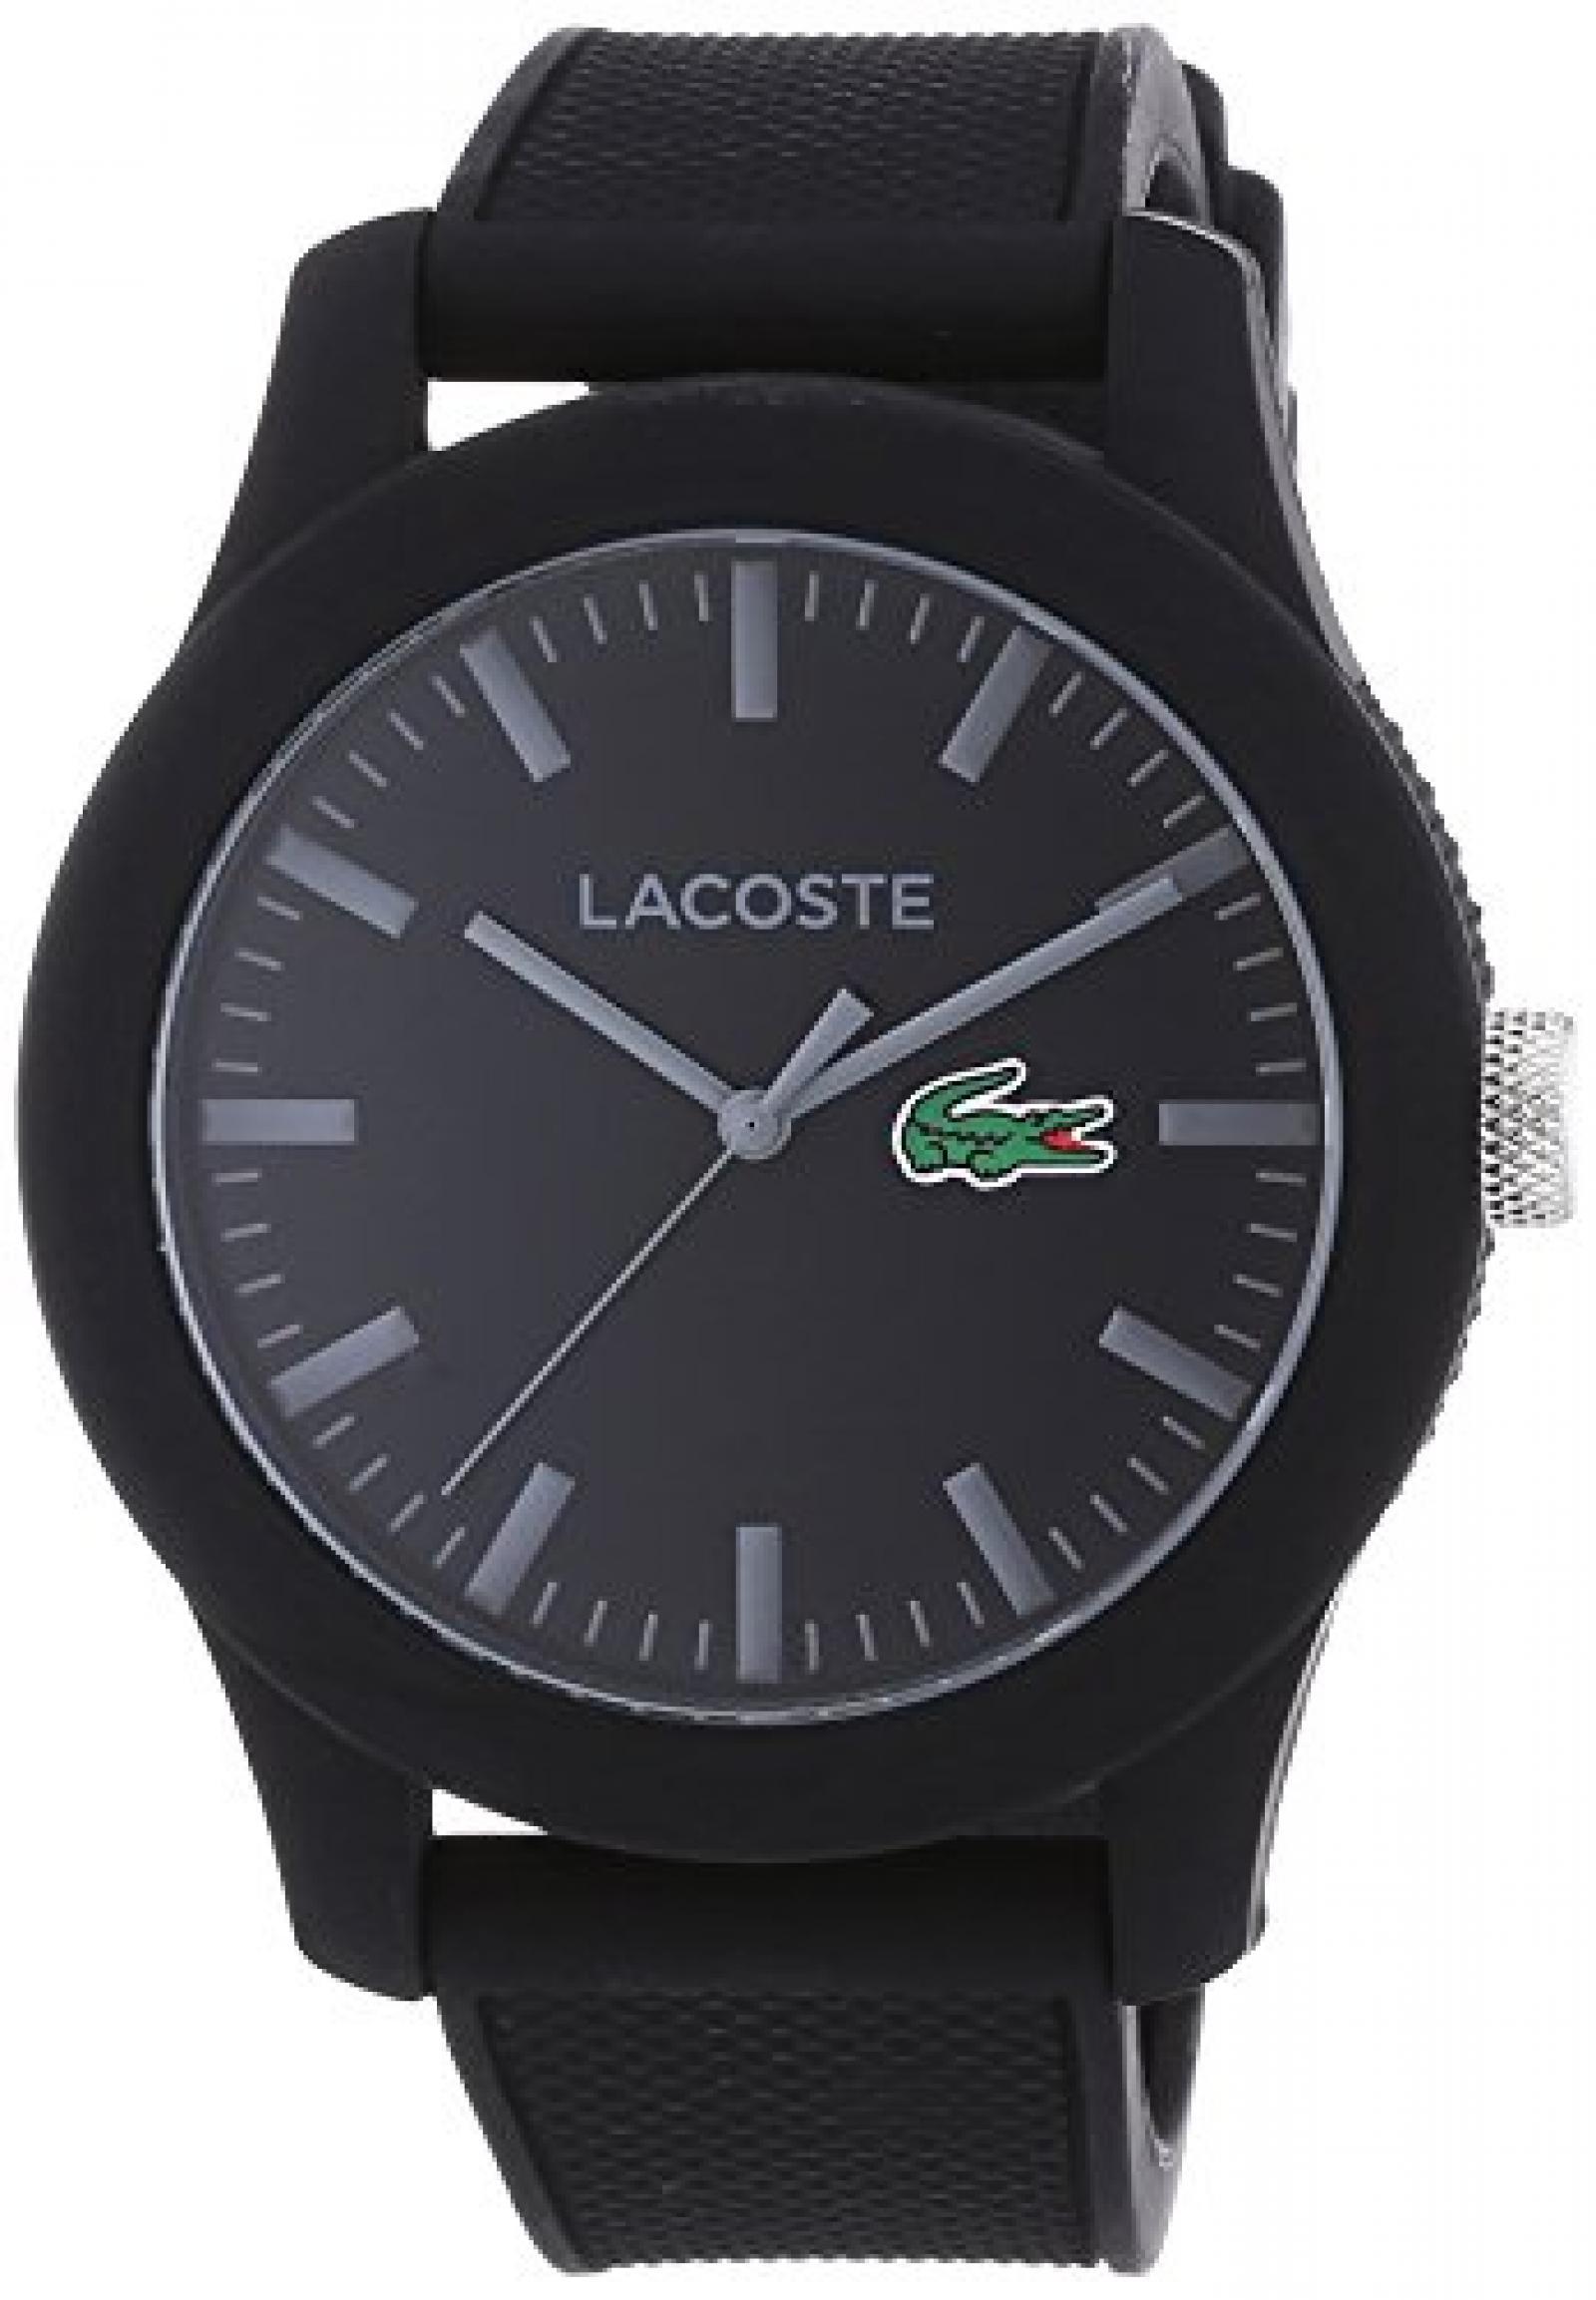 Lacoste Herren-Armbanduhr XL L.12.12 Analog Quarz Silikon 2010766